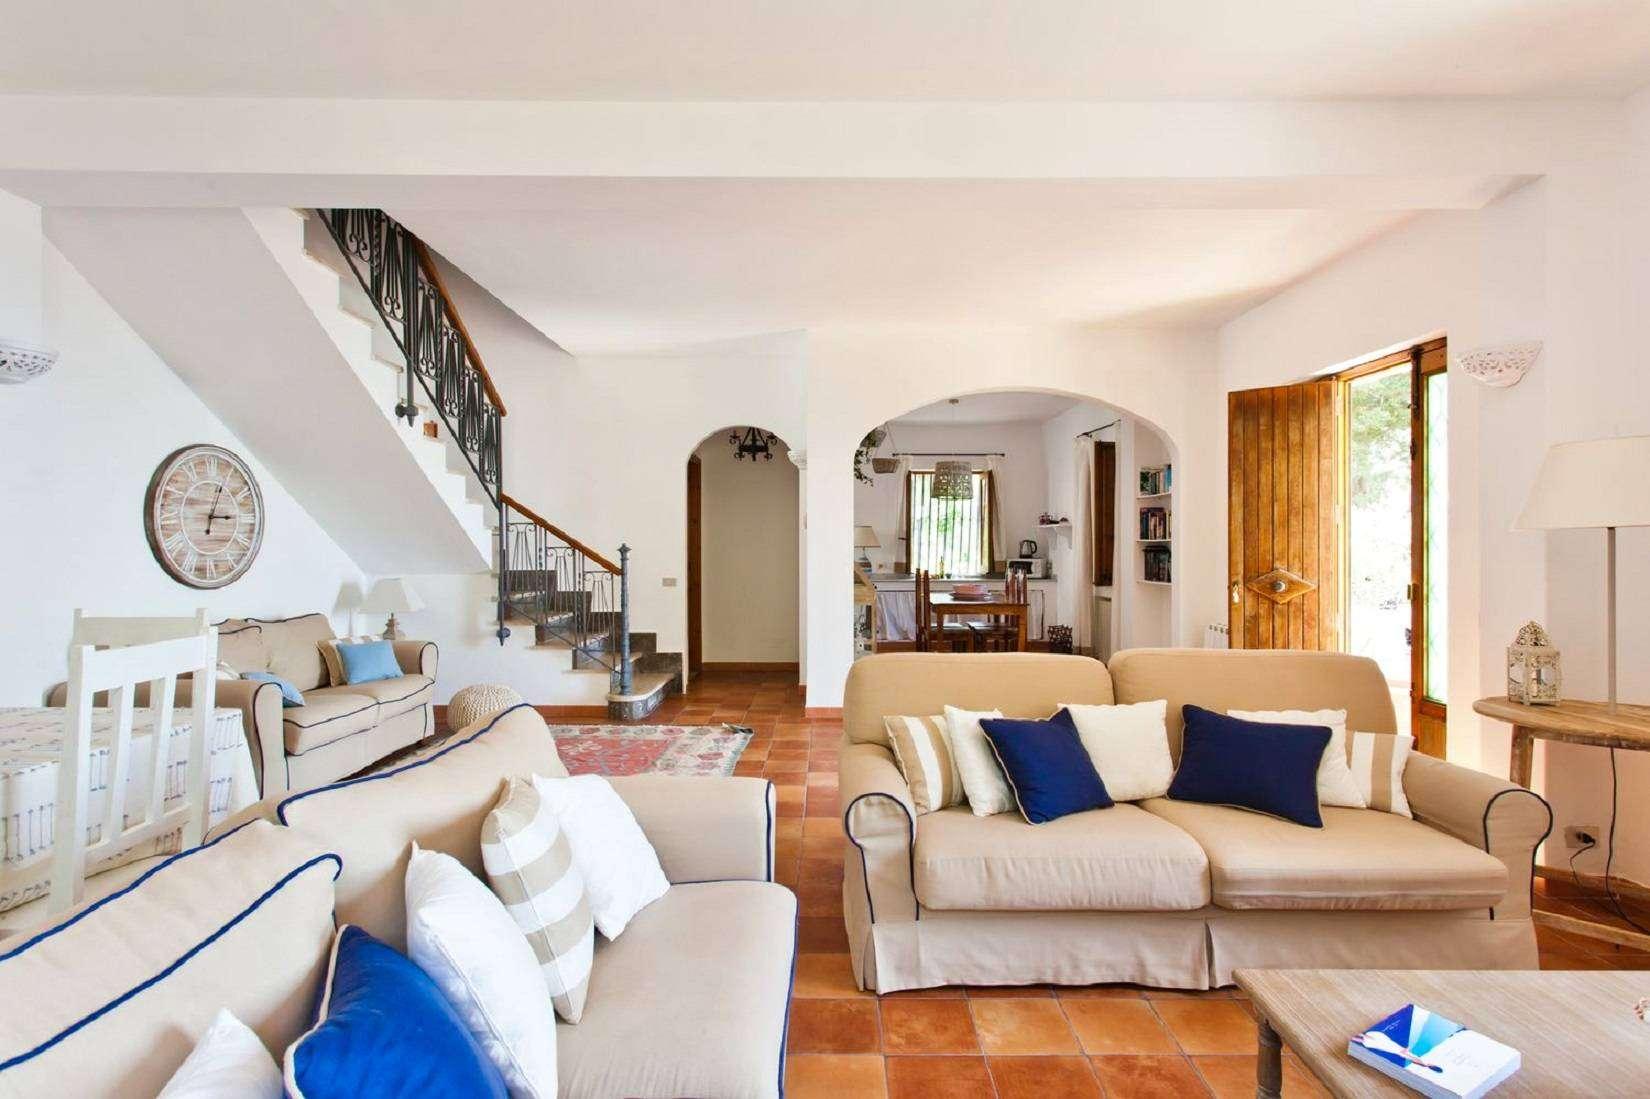 2 La Rocca Living room